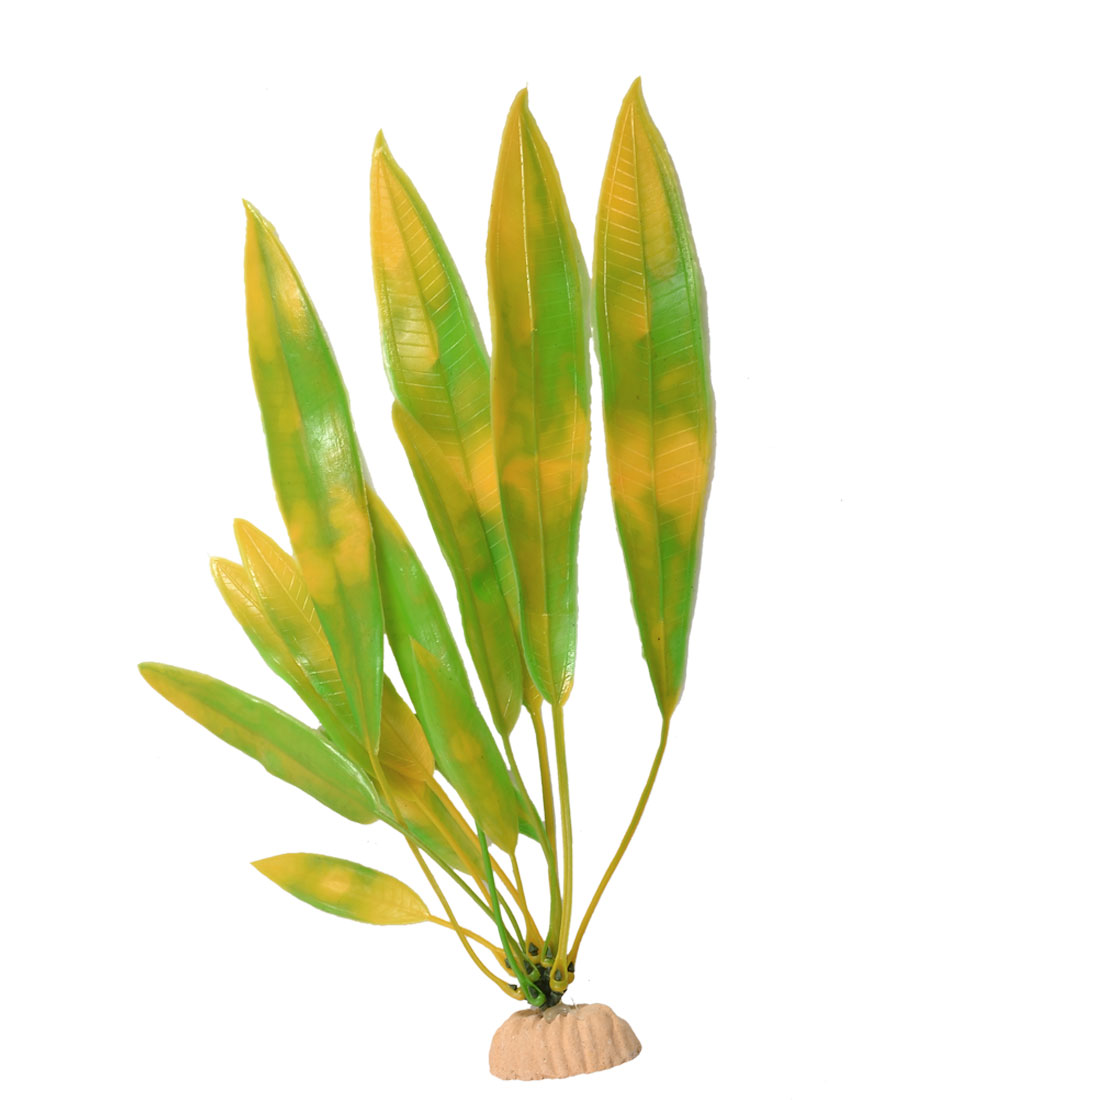 Plastic Green Yellow Slender Leaf Underwater Plant Aquarium Fish Tank Ornament